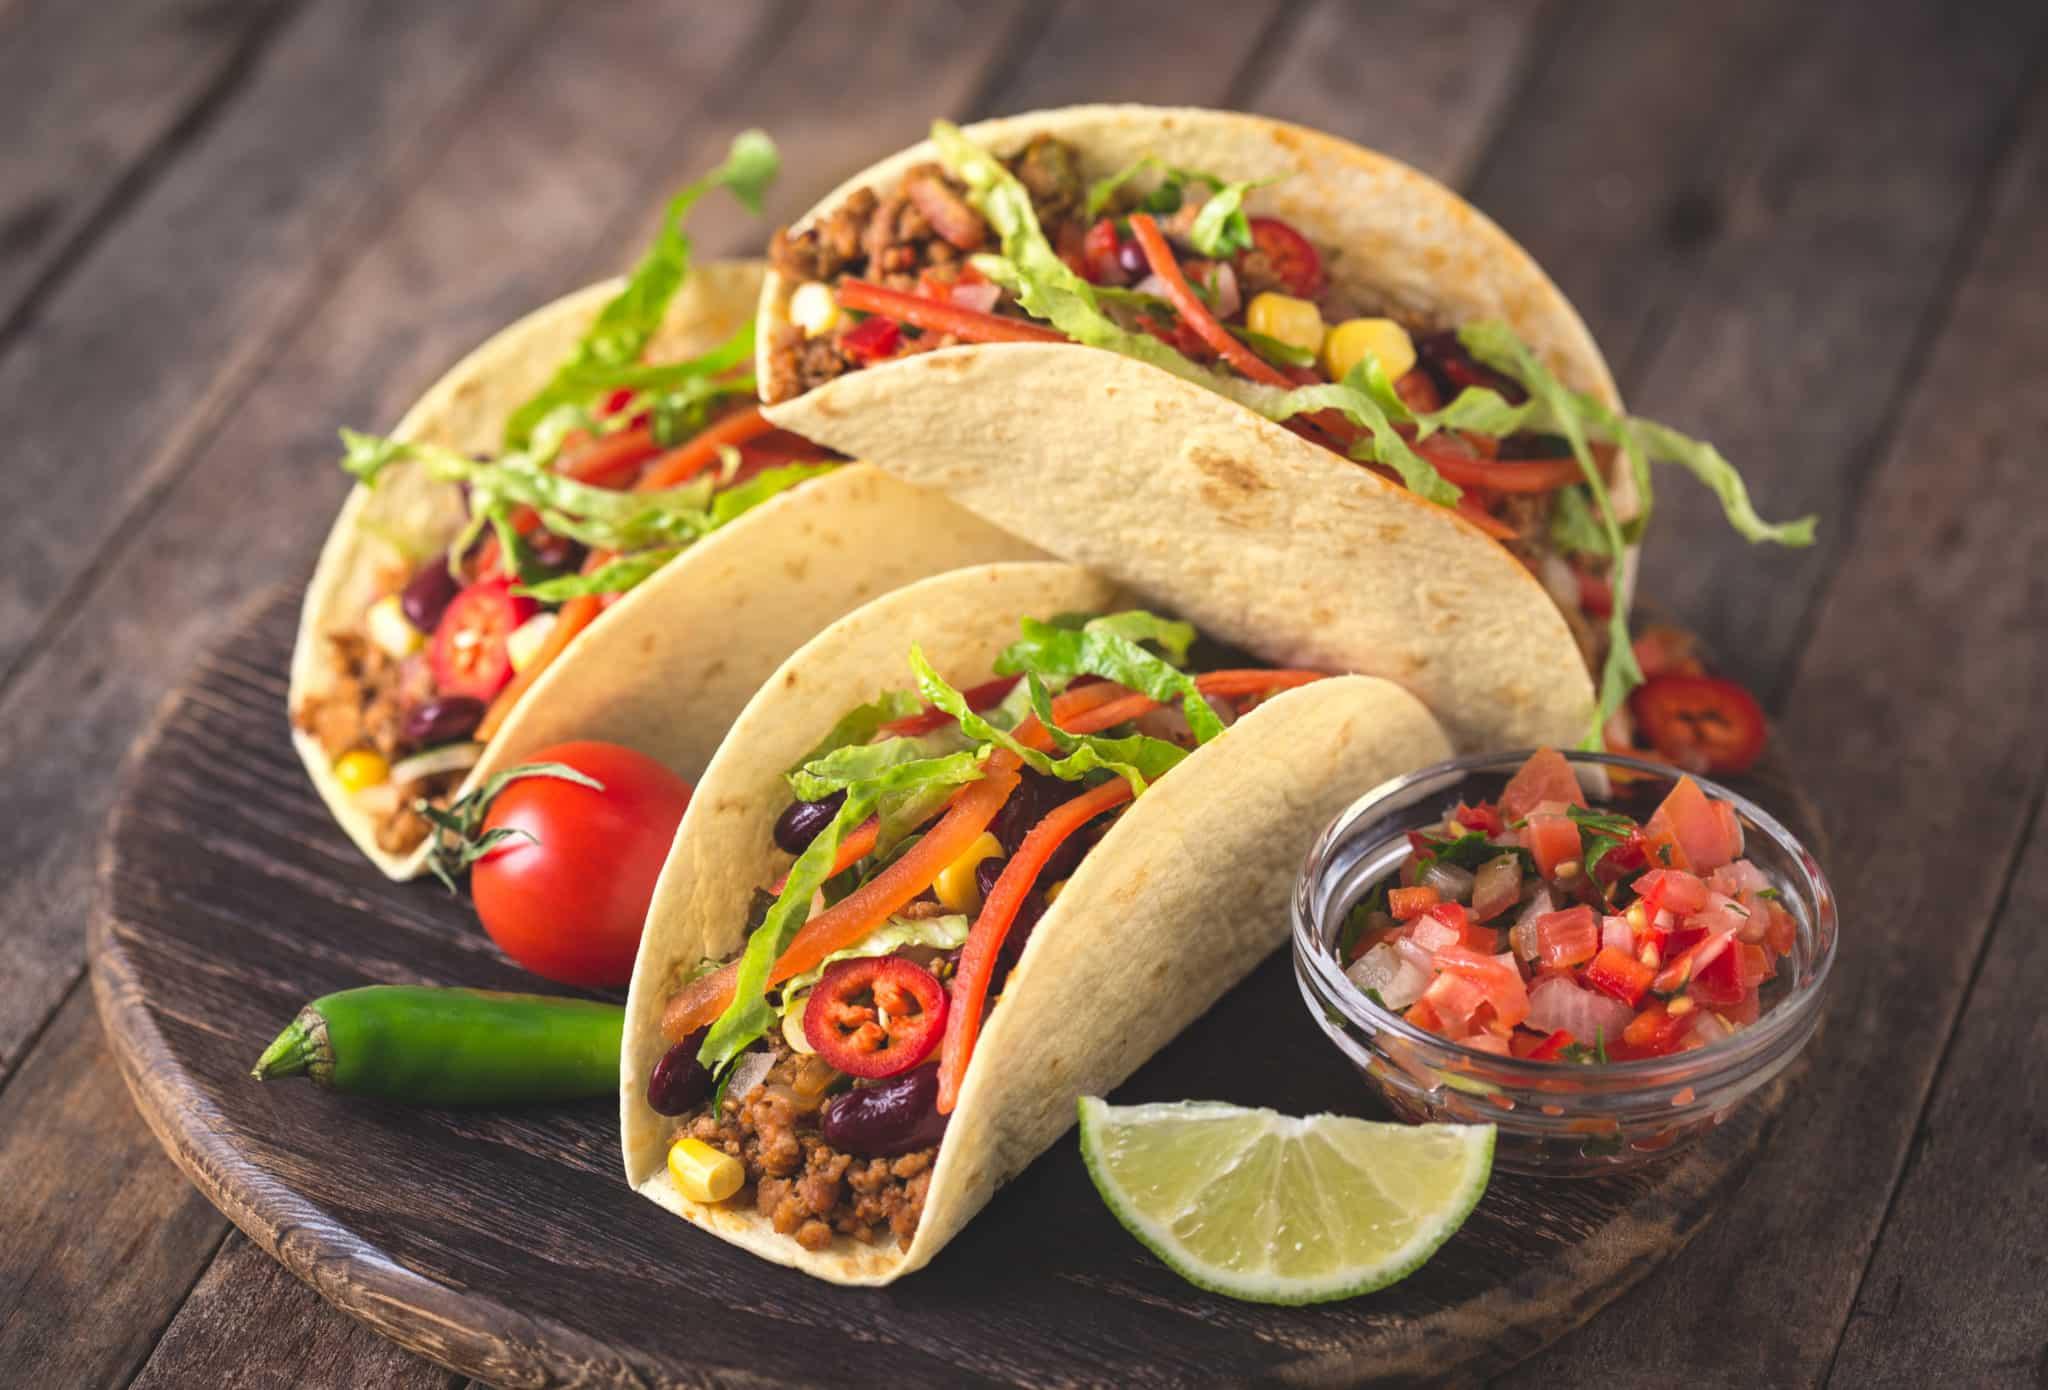 Marisol's vegetarian tacos